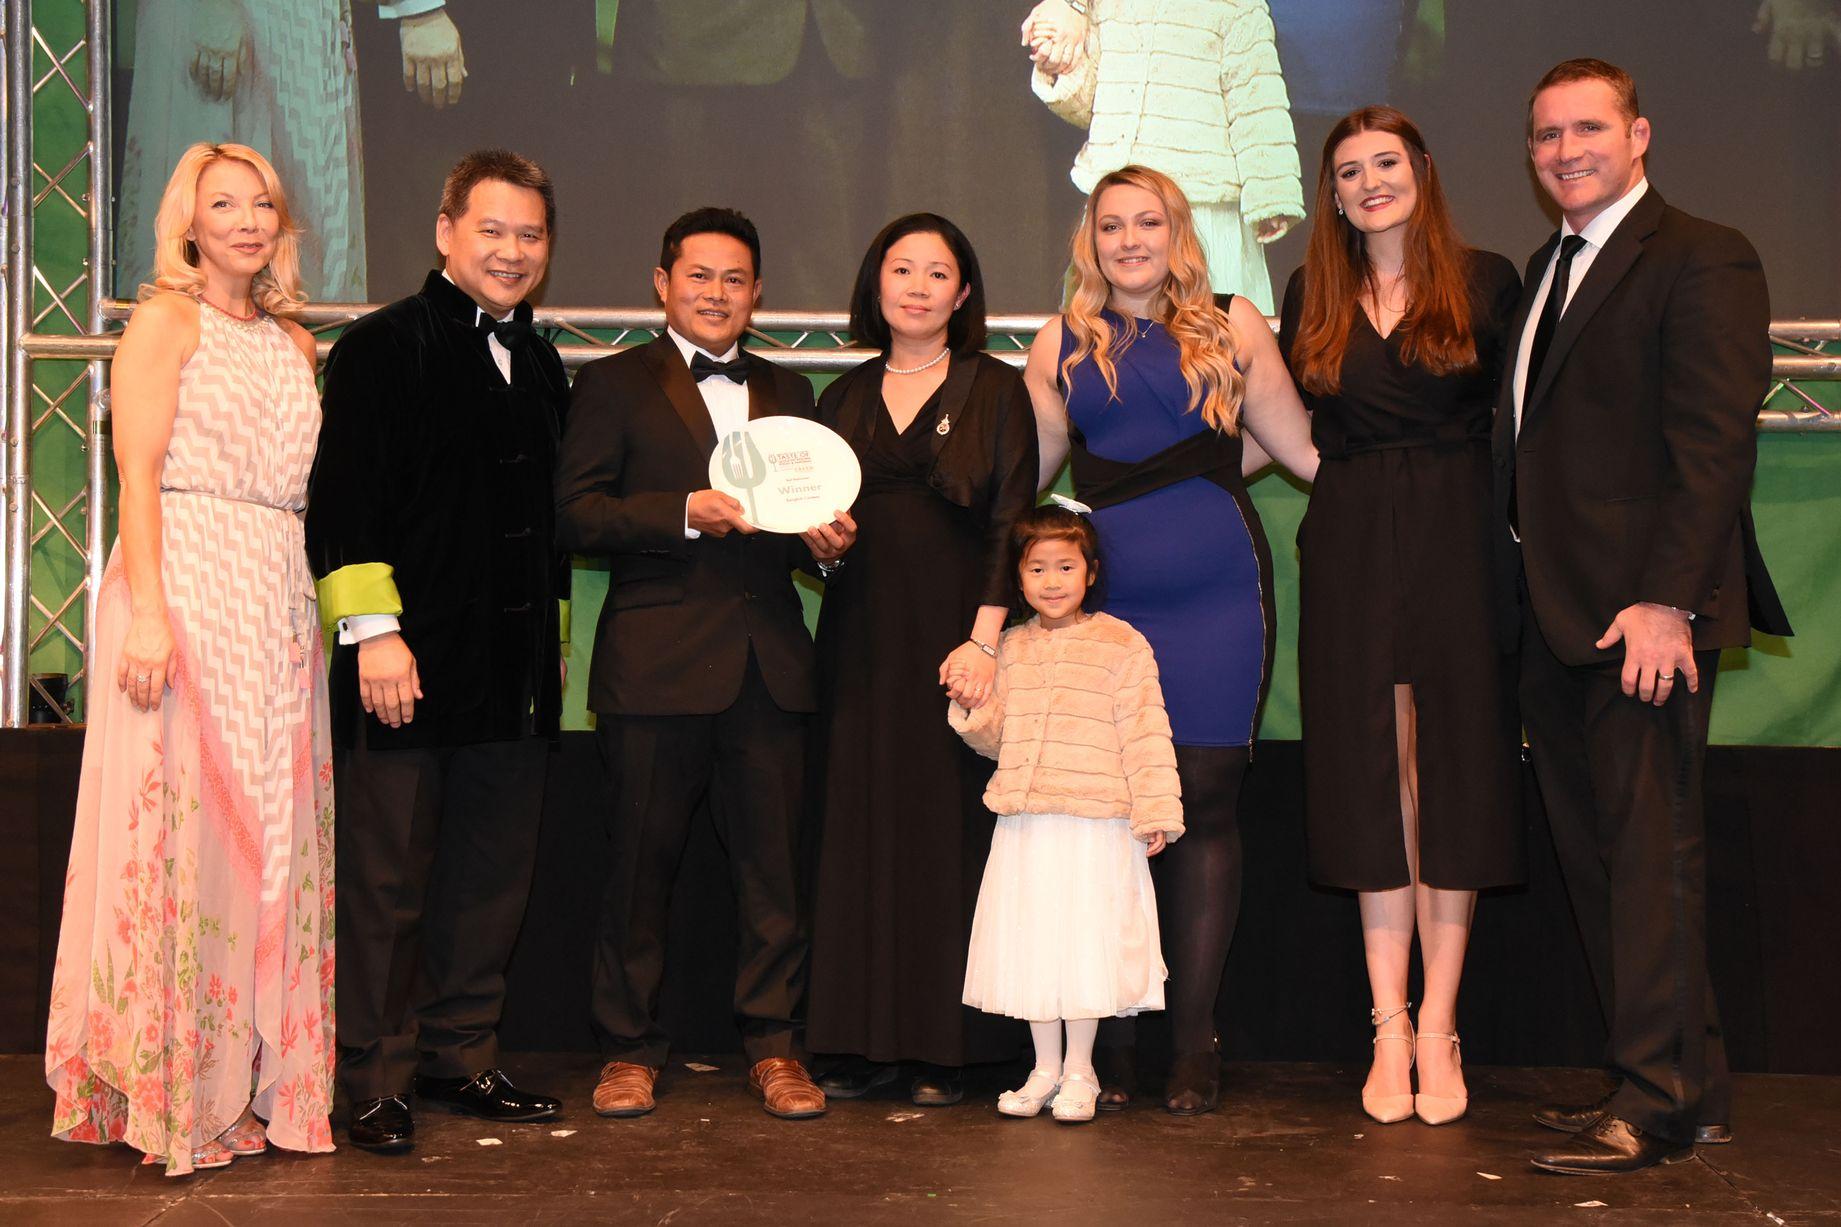 Taste of Gloucestershire 2017, Best Restaurant Winners - Bangkok Canteen, Gloucester